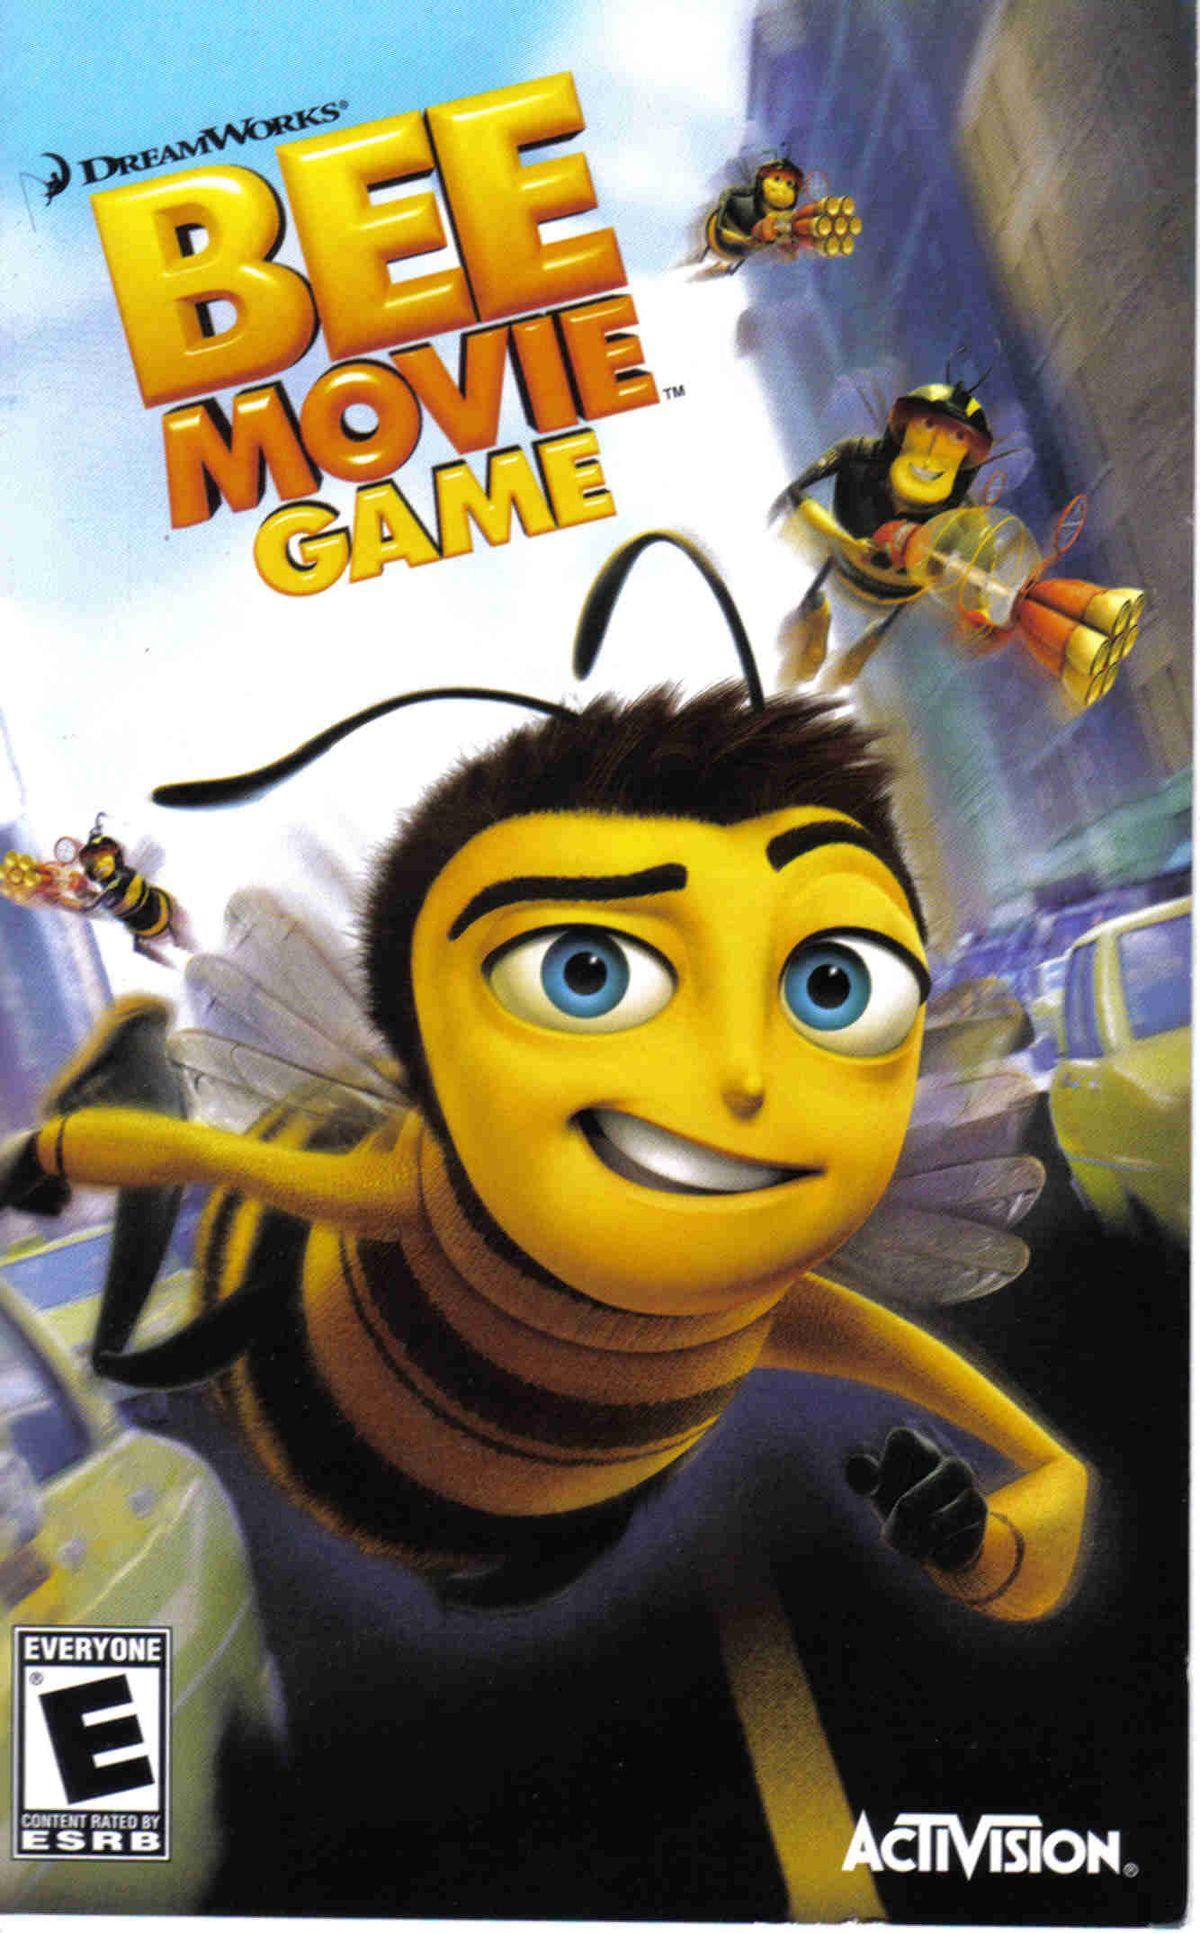 Movie Games For Ps3 : Bee movie game wikipedia bahasa melayu ensiklopedia bebas